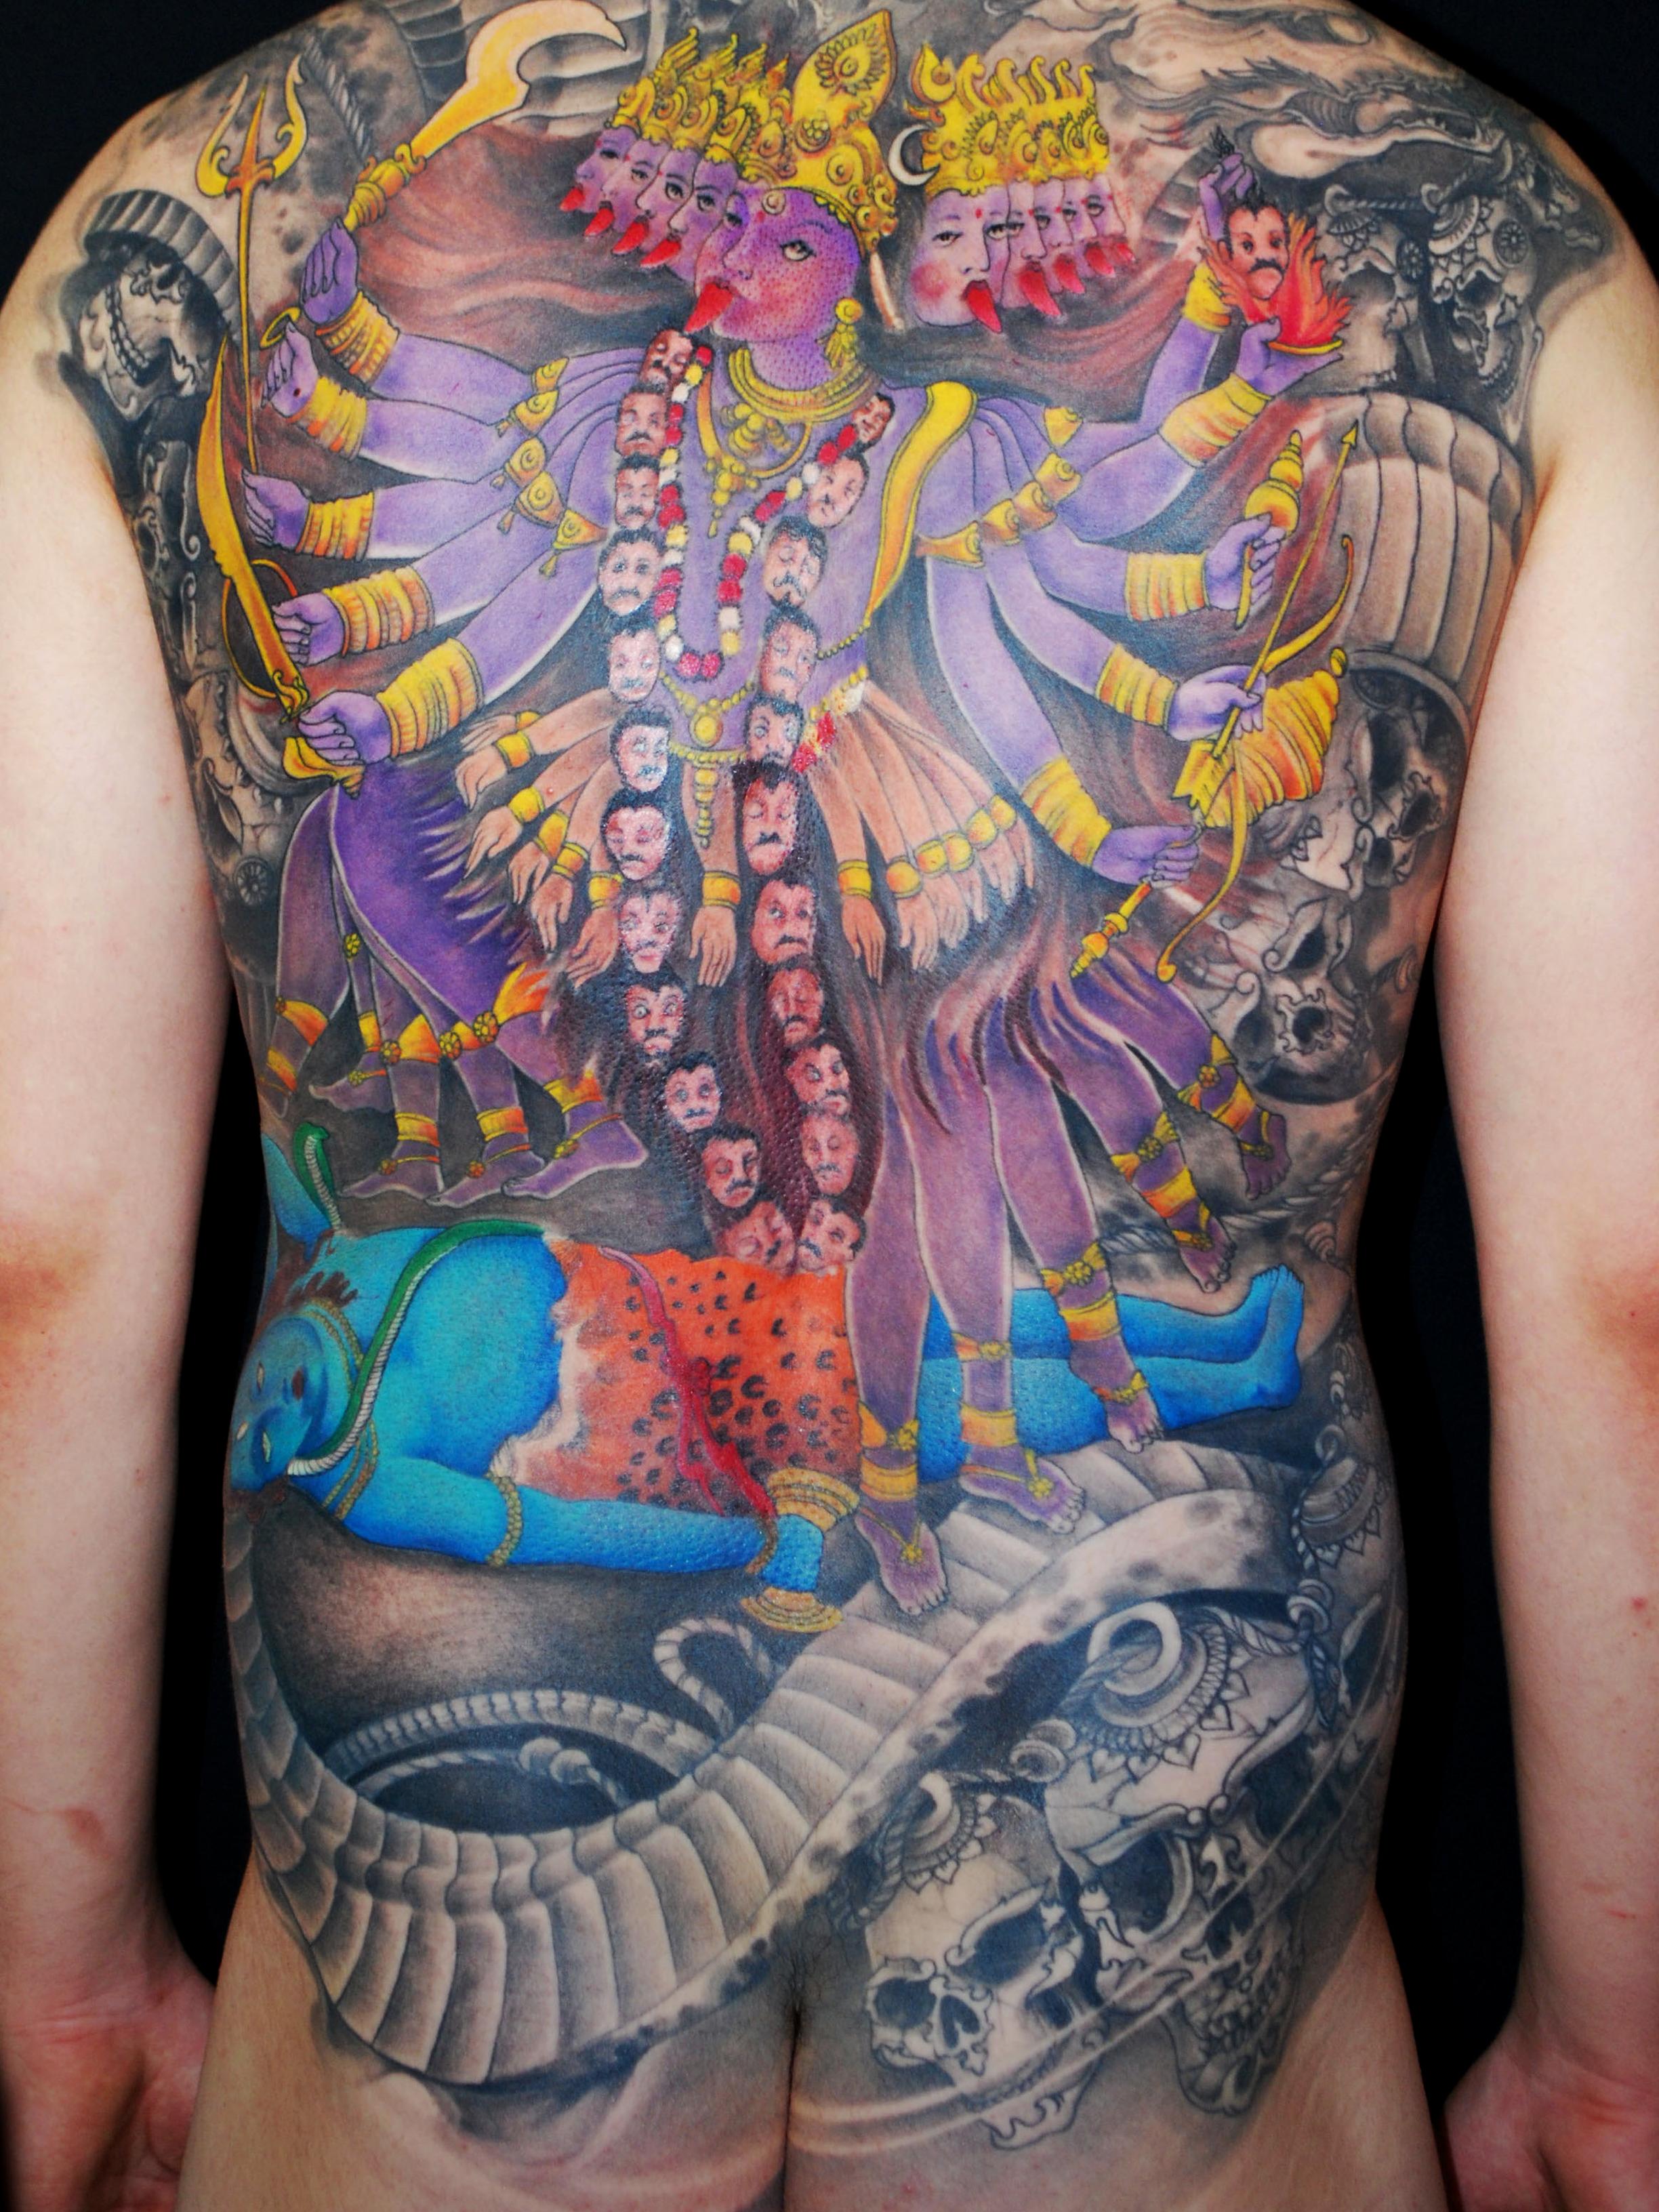 ueo-Tattoo-Tatuaggi-Como-Chiasso-Giapponese-Schiena-2017-27